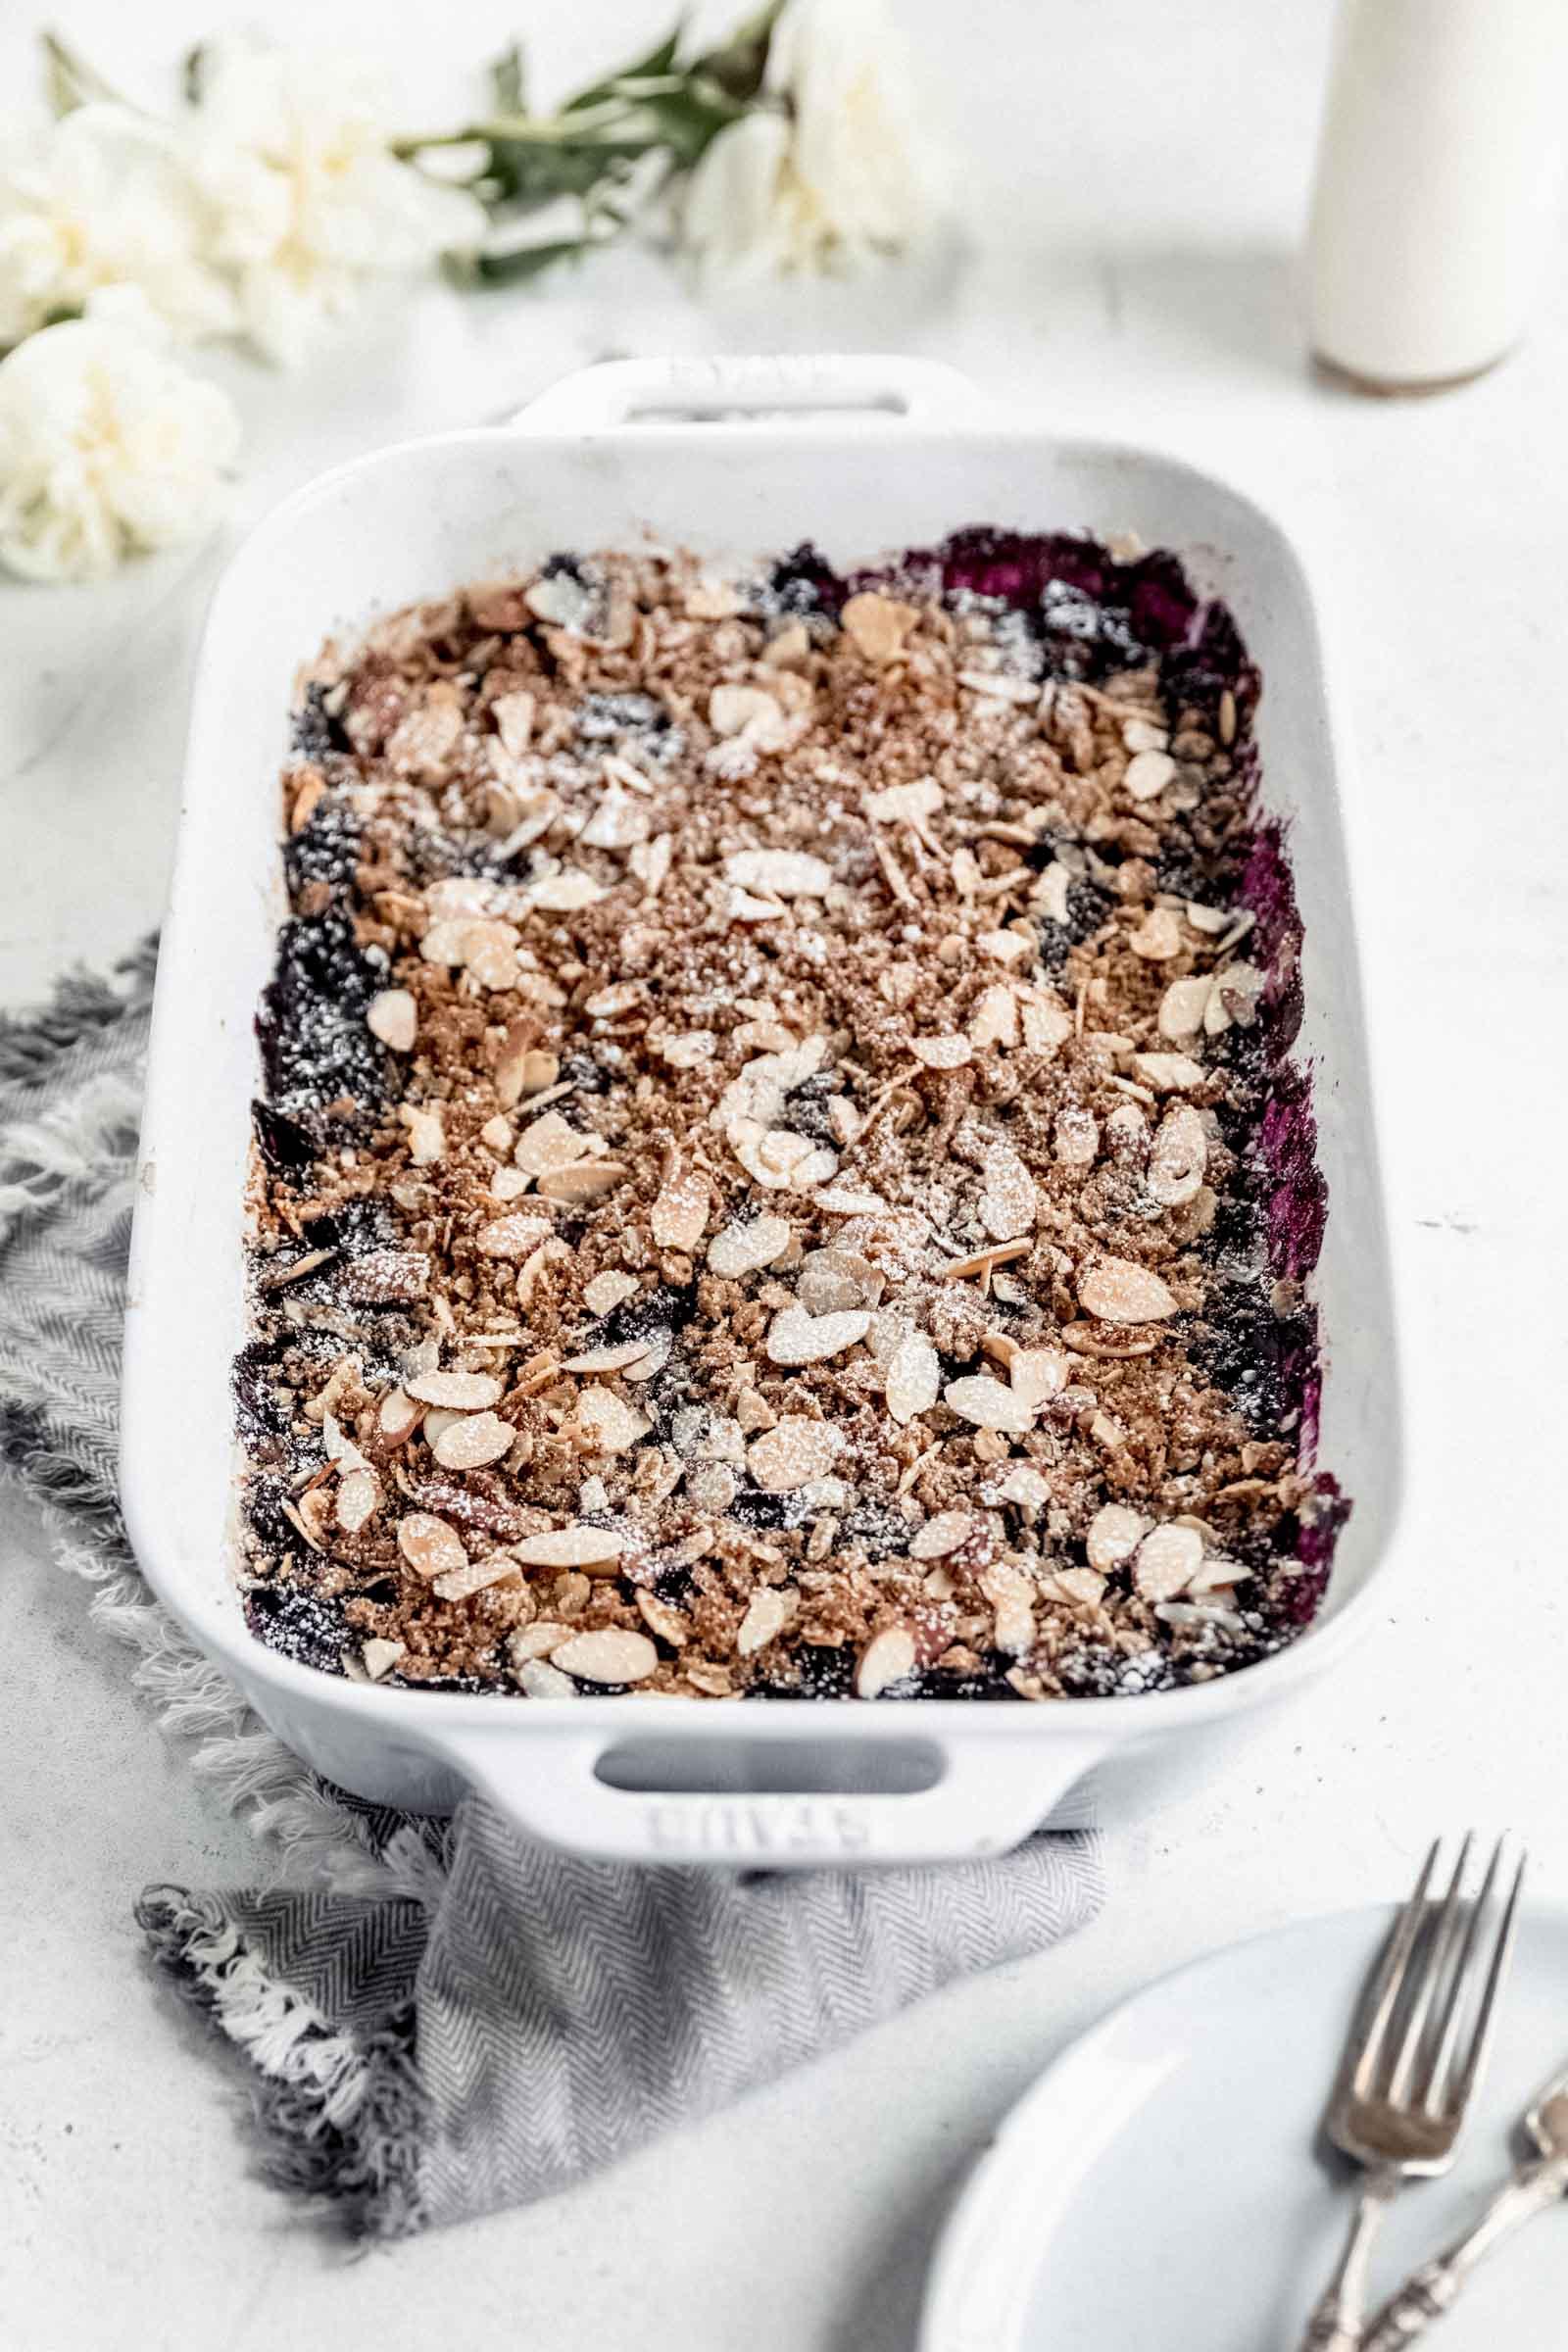 vegan blueberry crisp sprinkled with powdered sugar